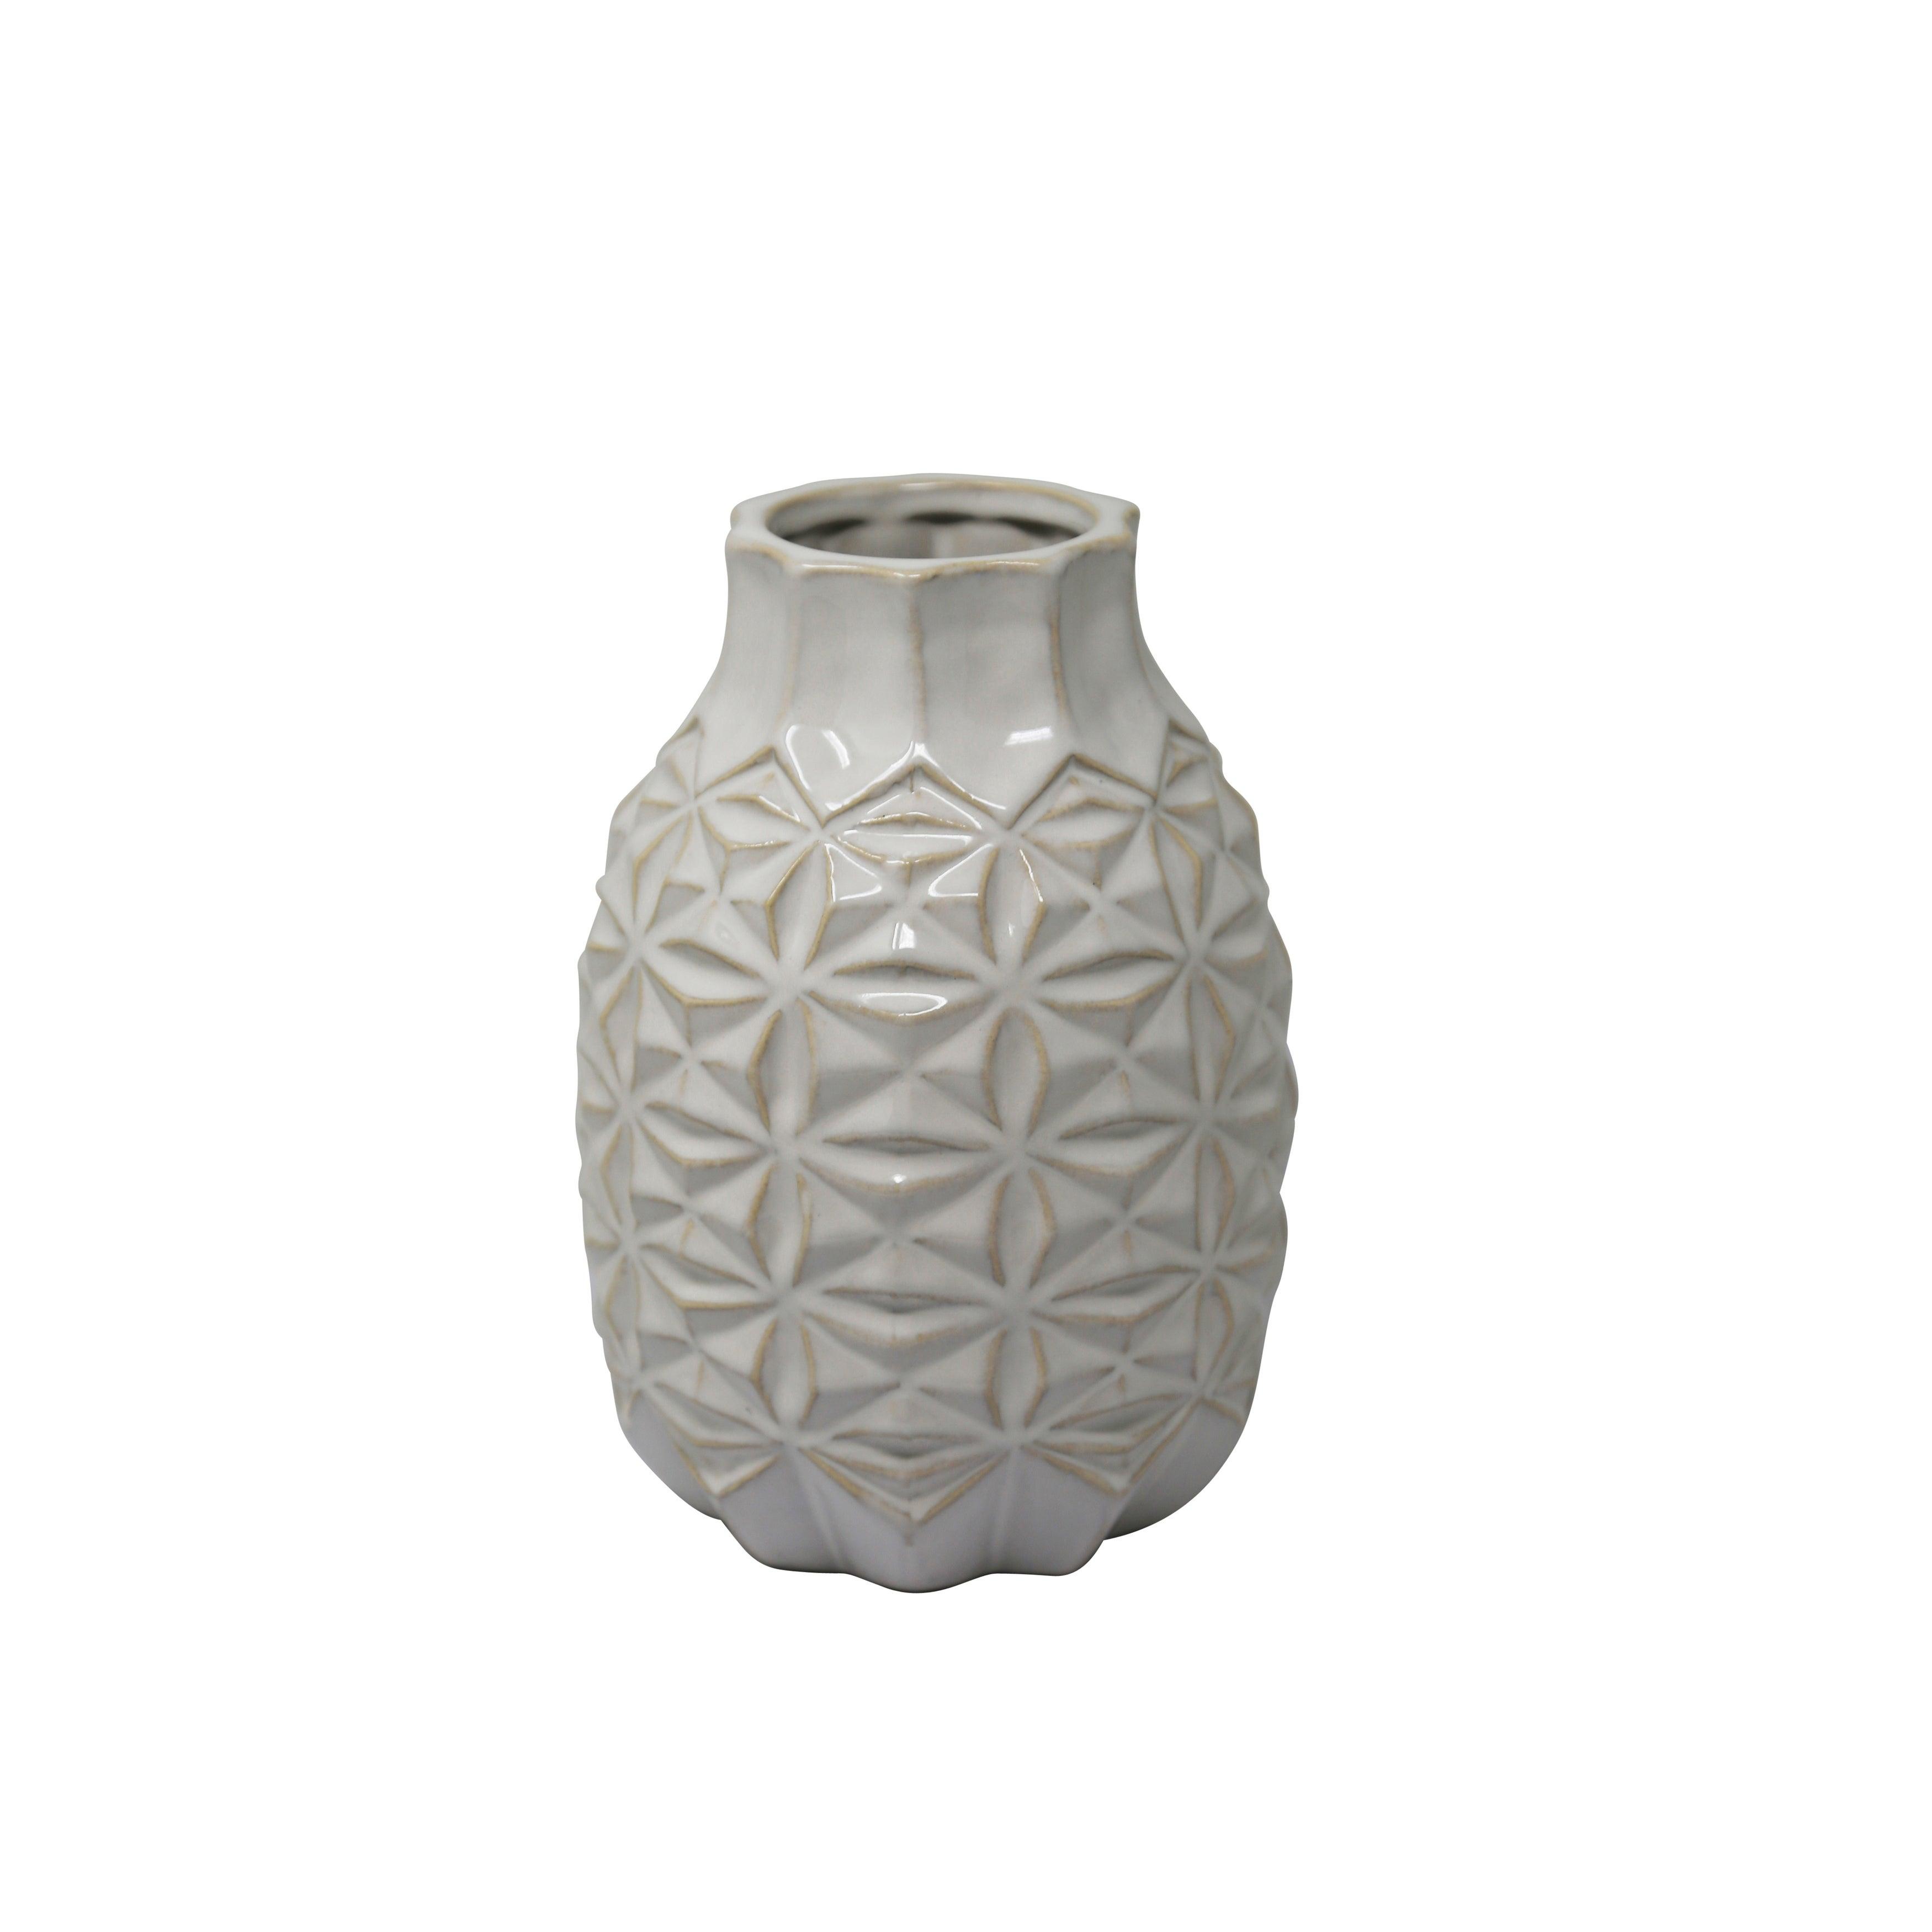 Ceramic Vase with Embossed Geometric Design Pattern, Small, White